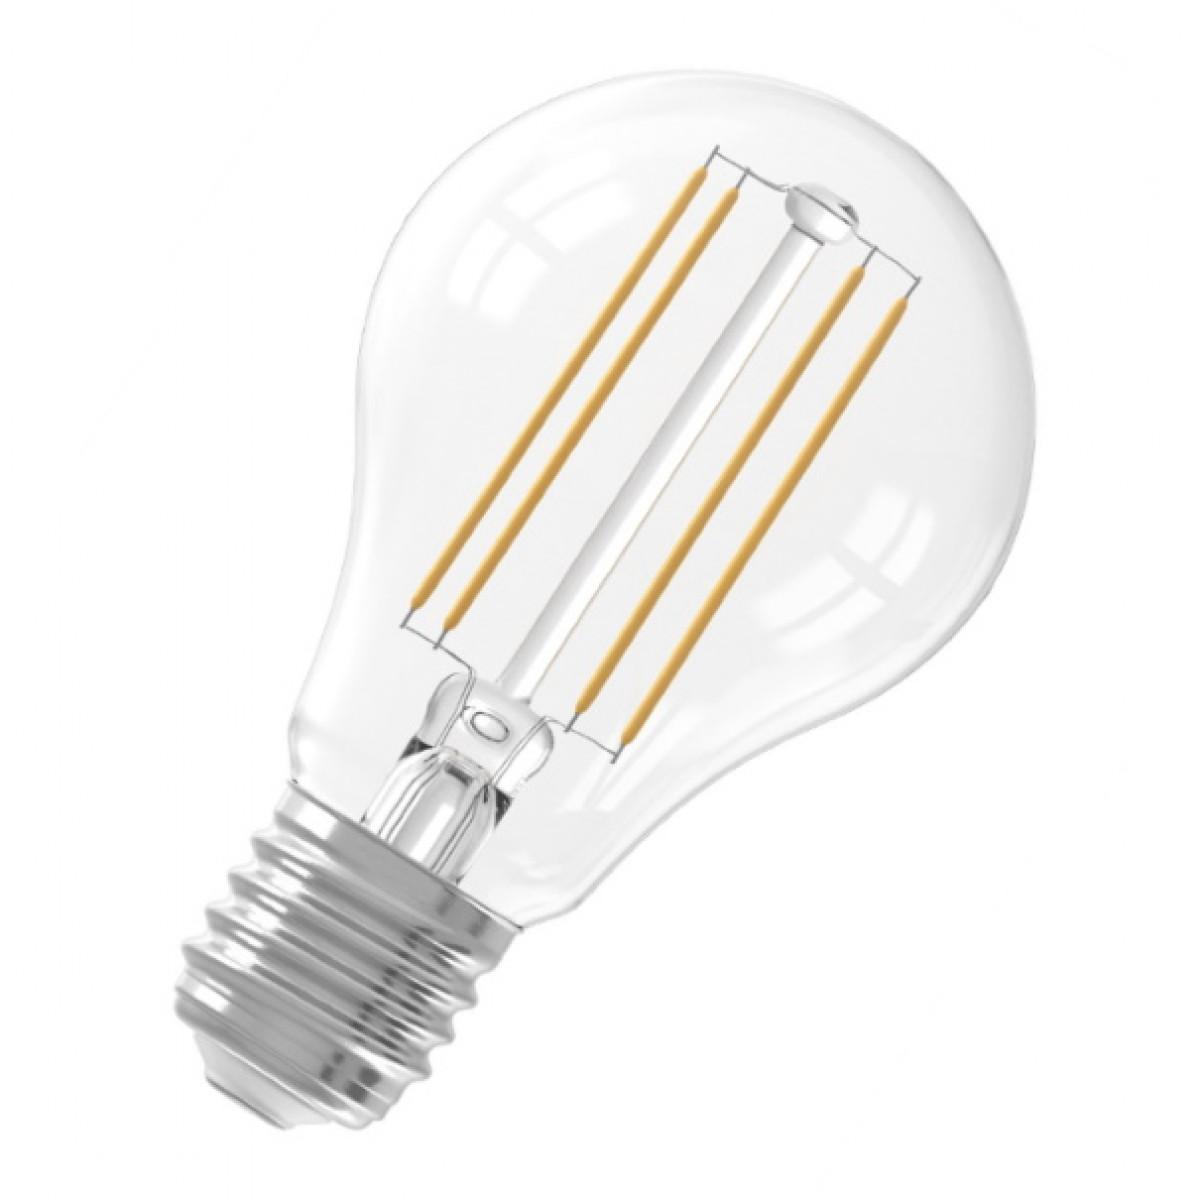 Hoge lichtopbrengst LED lichtbron - Nostalux ledlamp